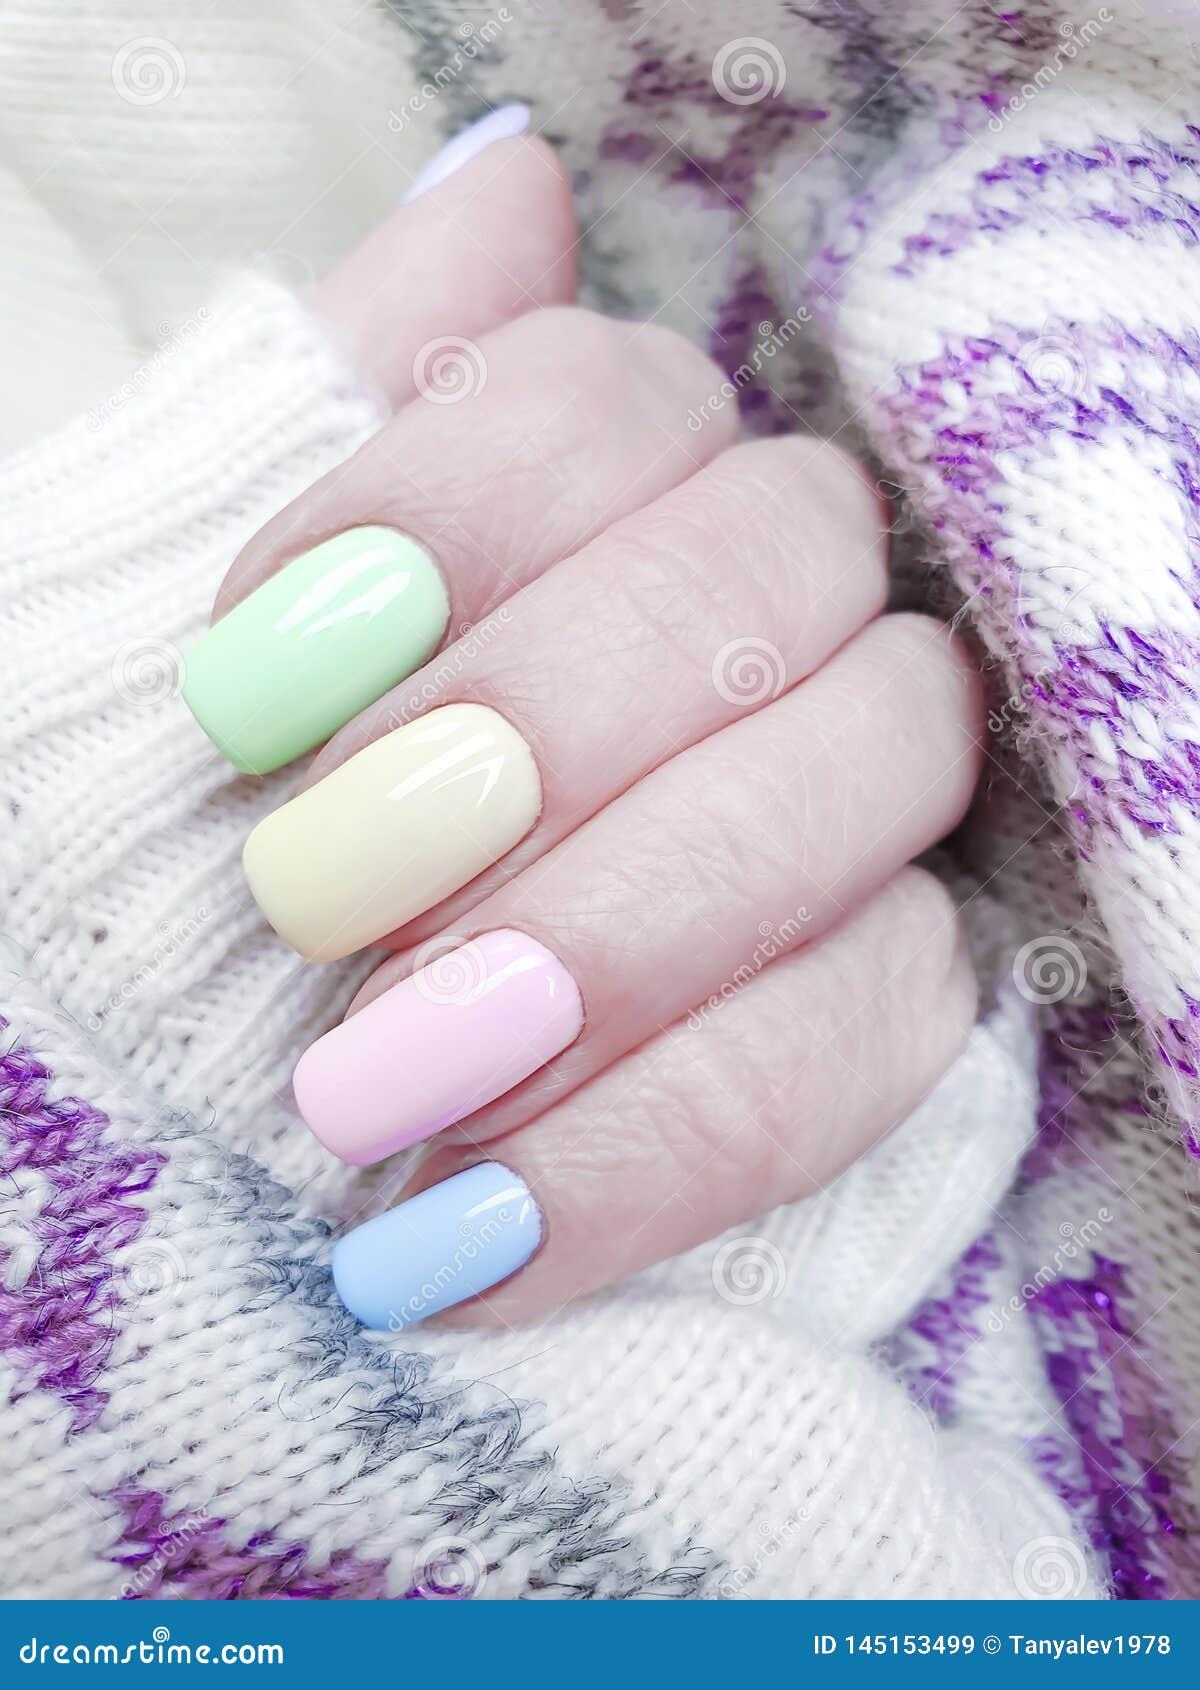 Żeńska ręka, piękna manicure u projekta dekoracji puloweru mody zima